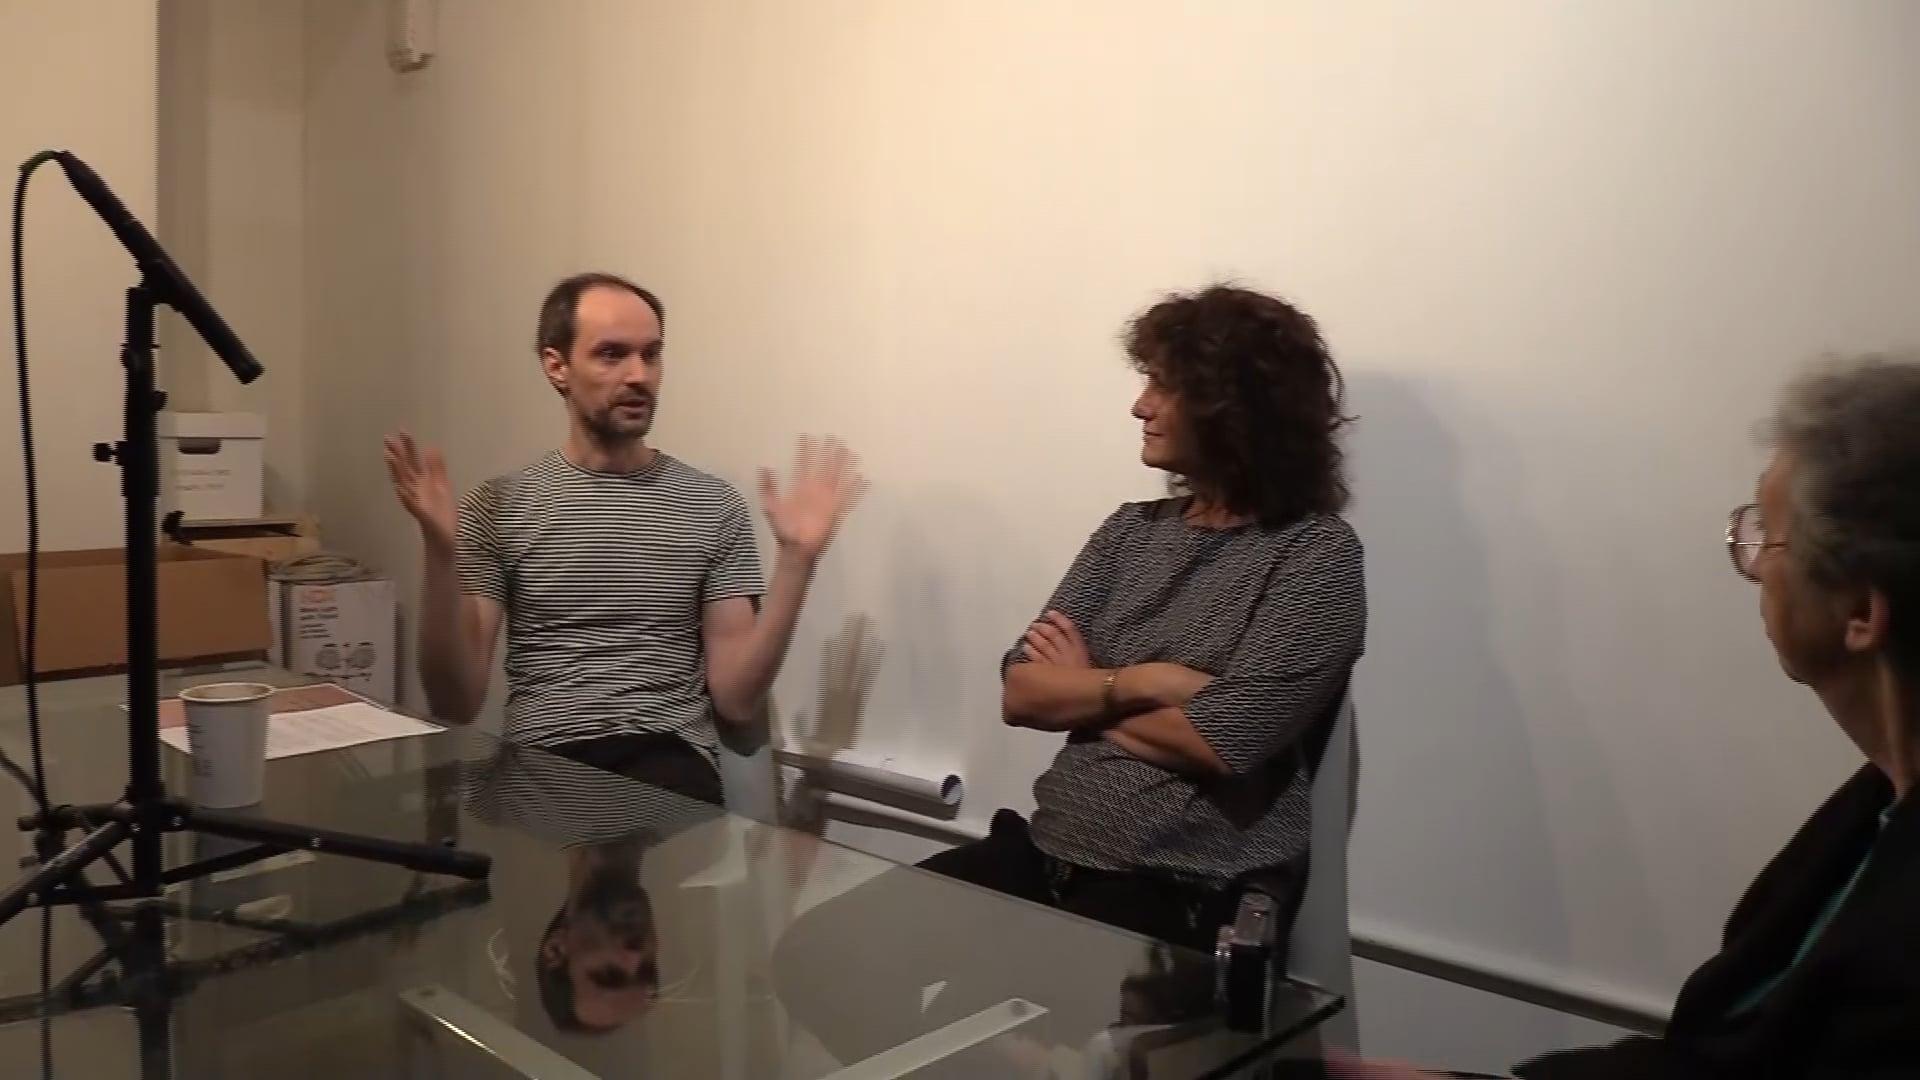 Interview with Daniel Neumann